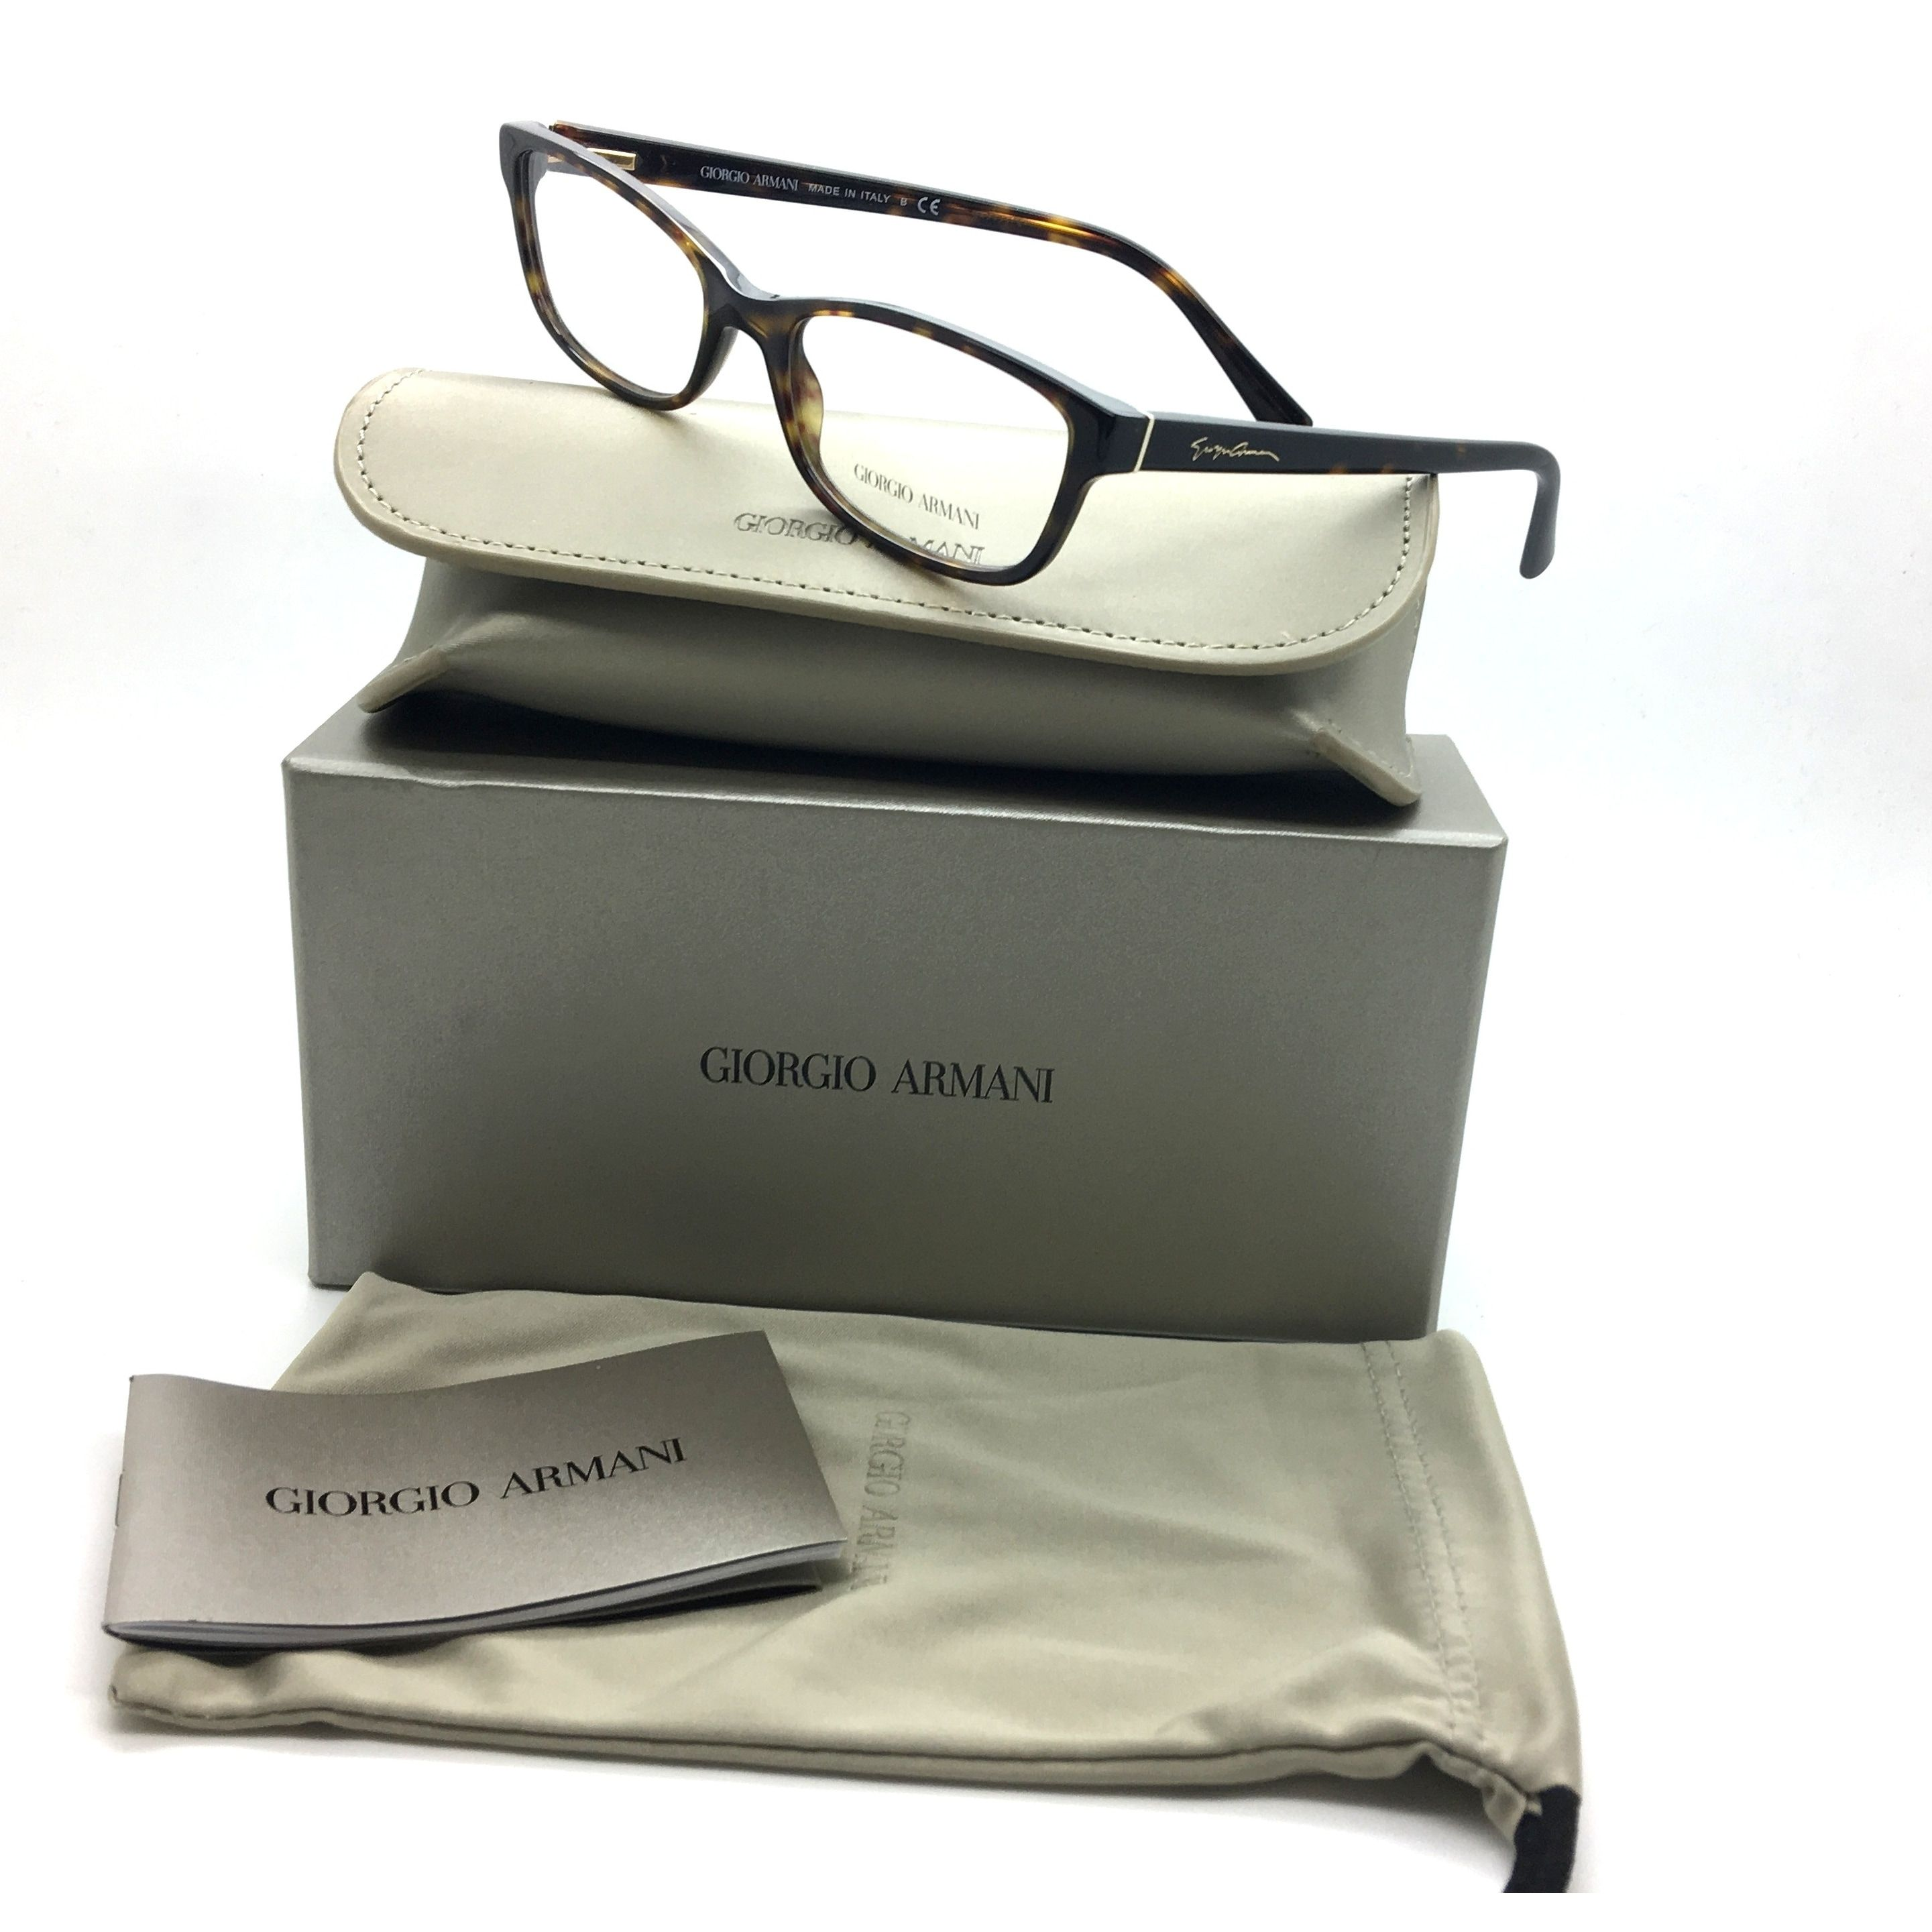 Giorgio Armani New Authentic   Products   Pinterest